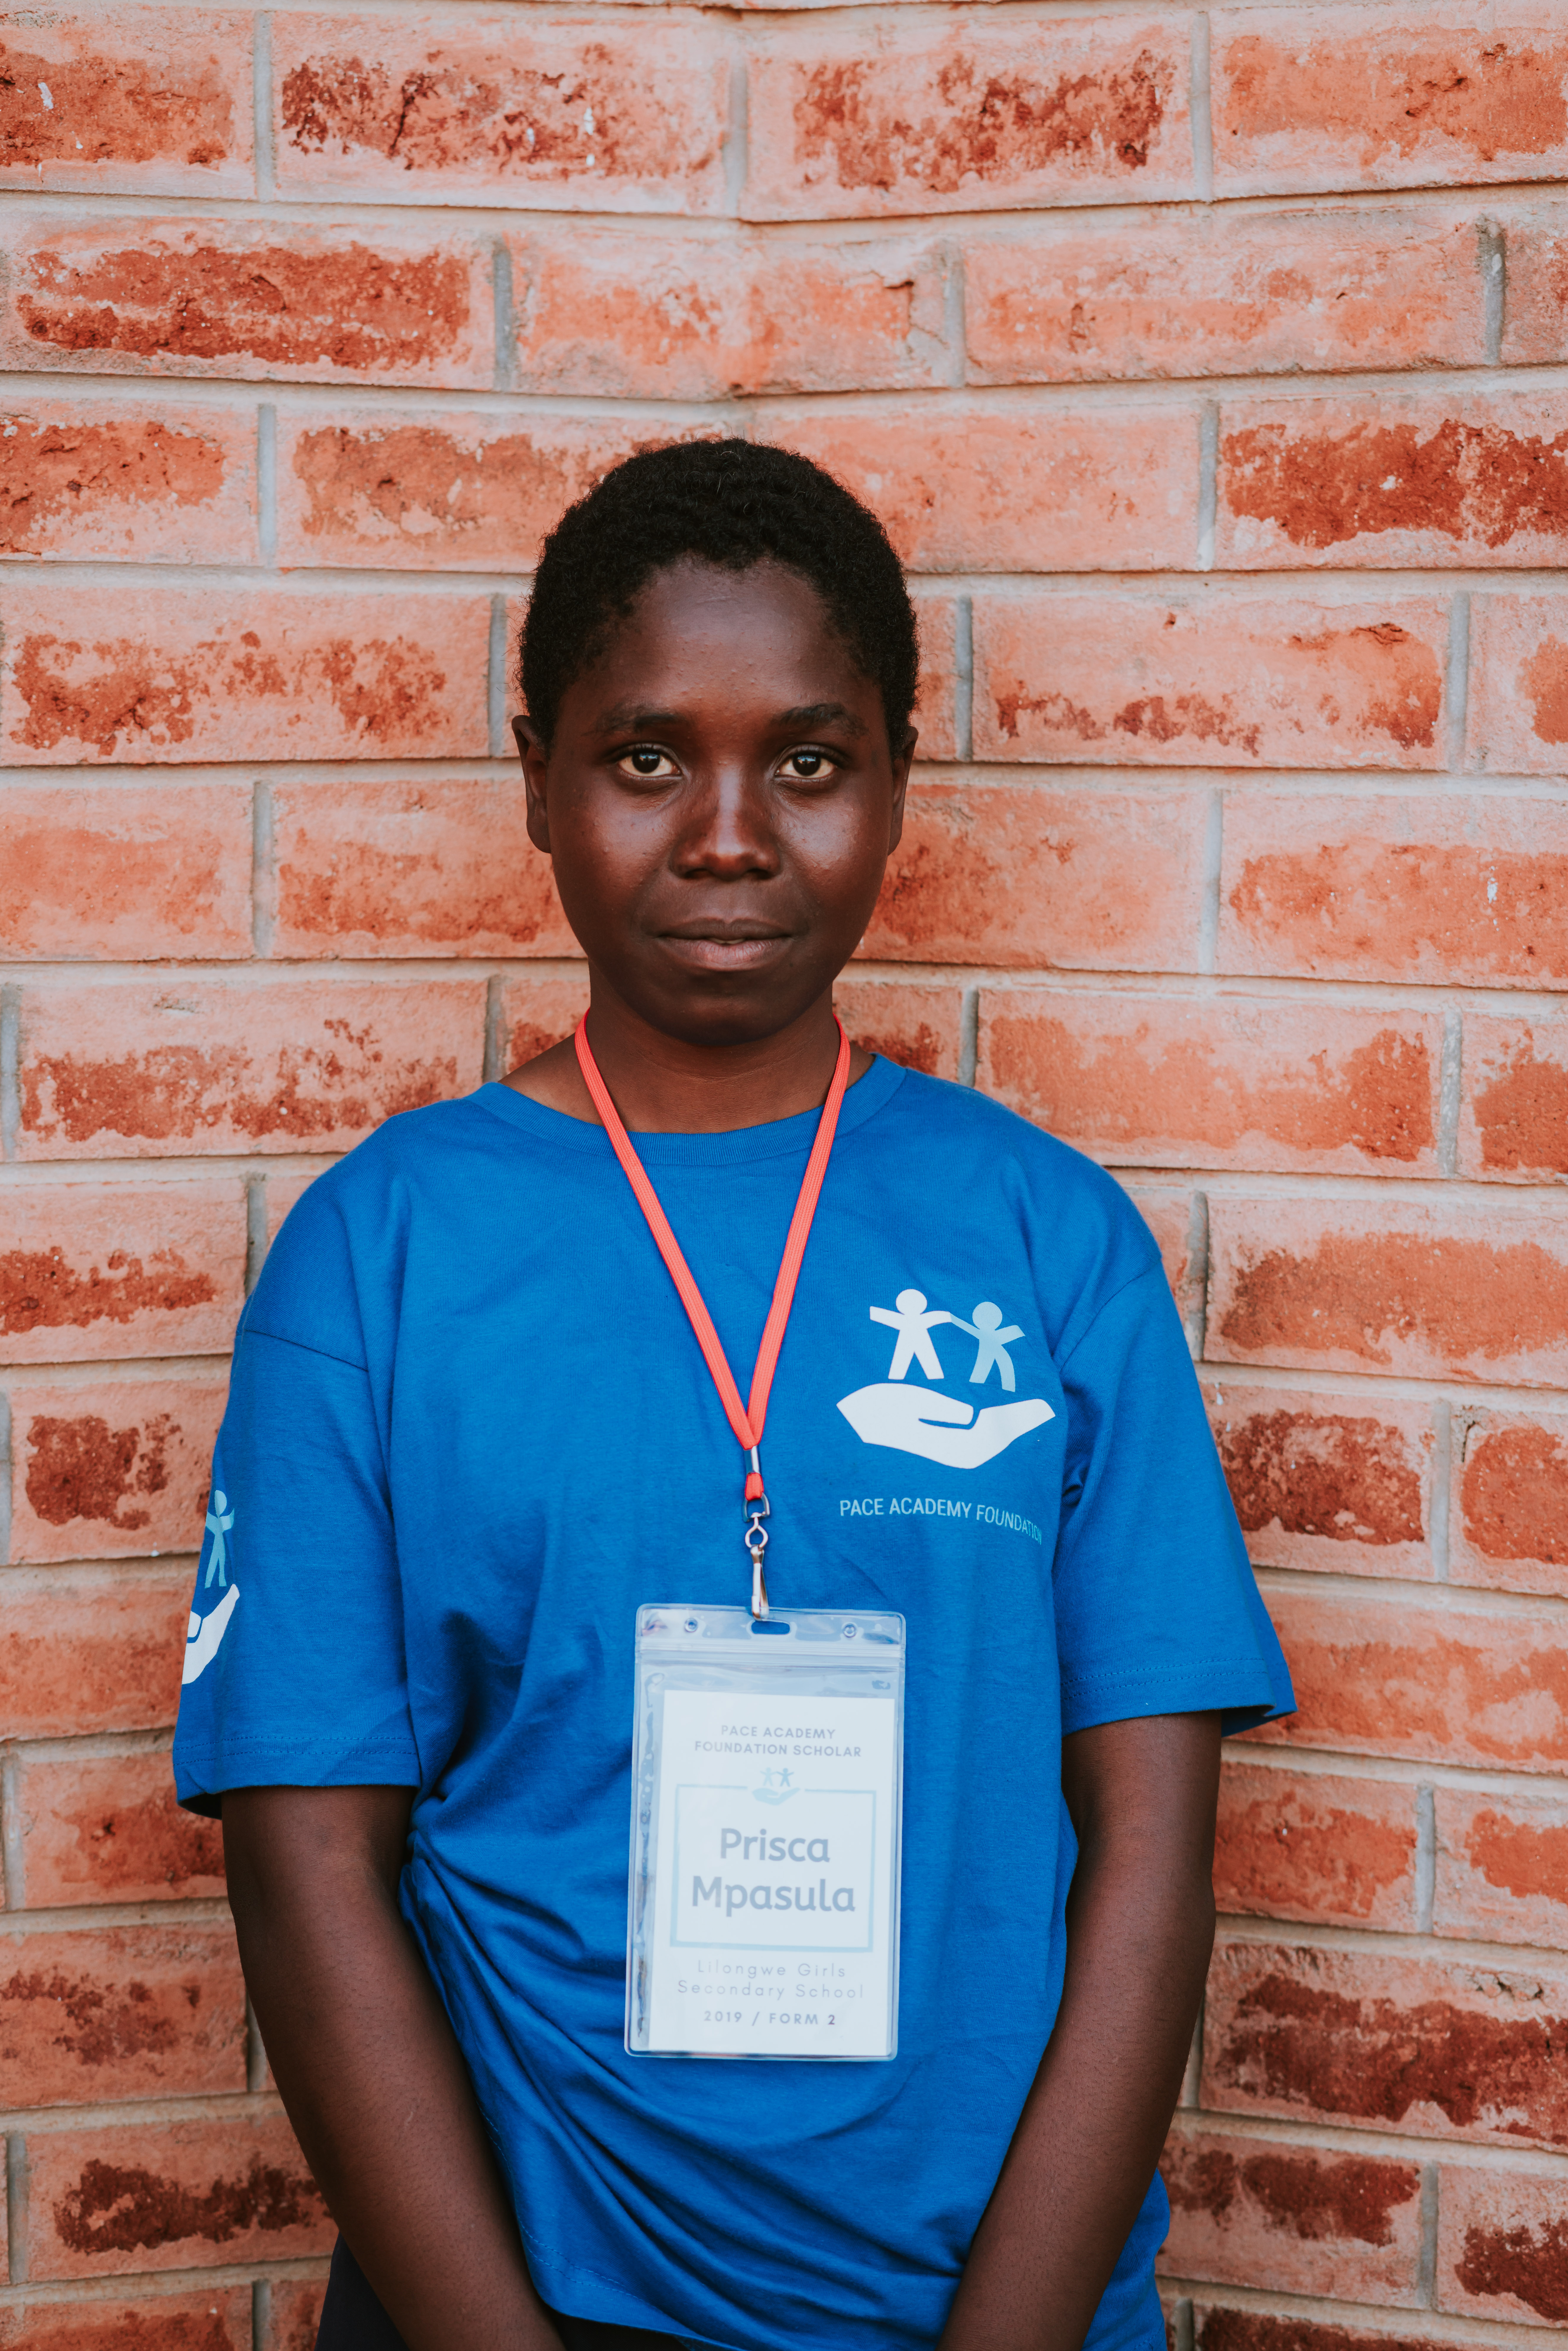 Prisca Mpasula (Lilongwe Girls Secondary